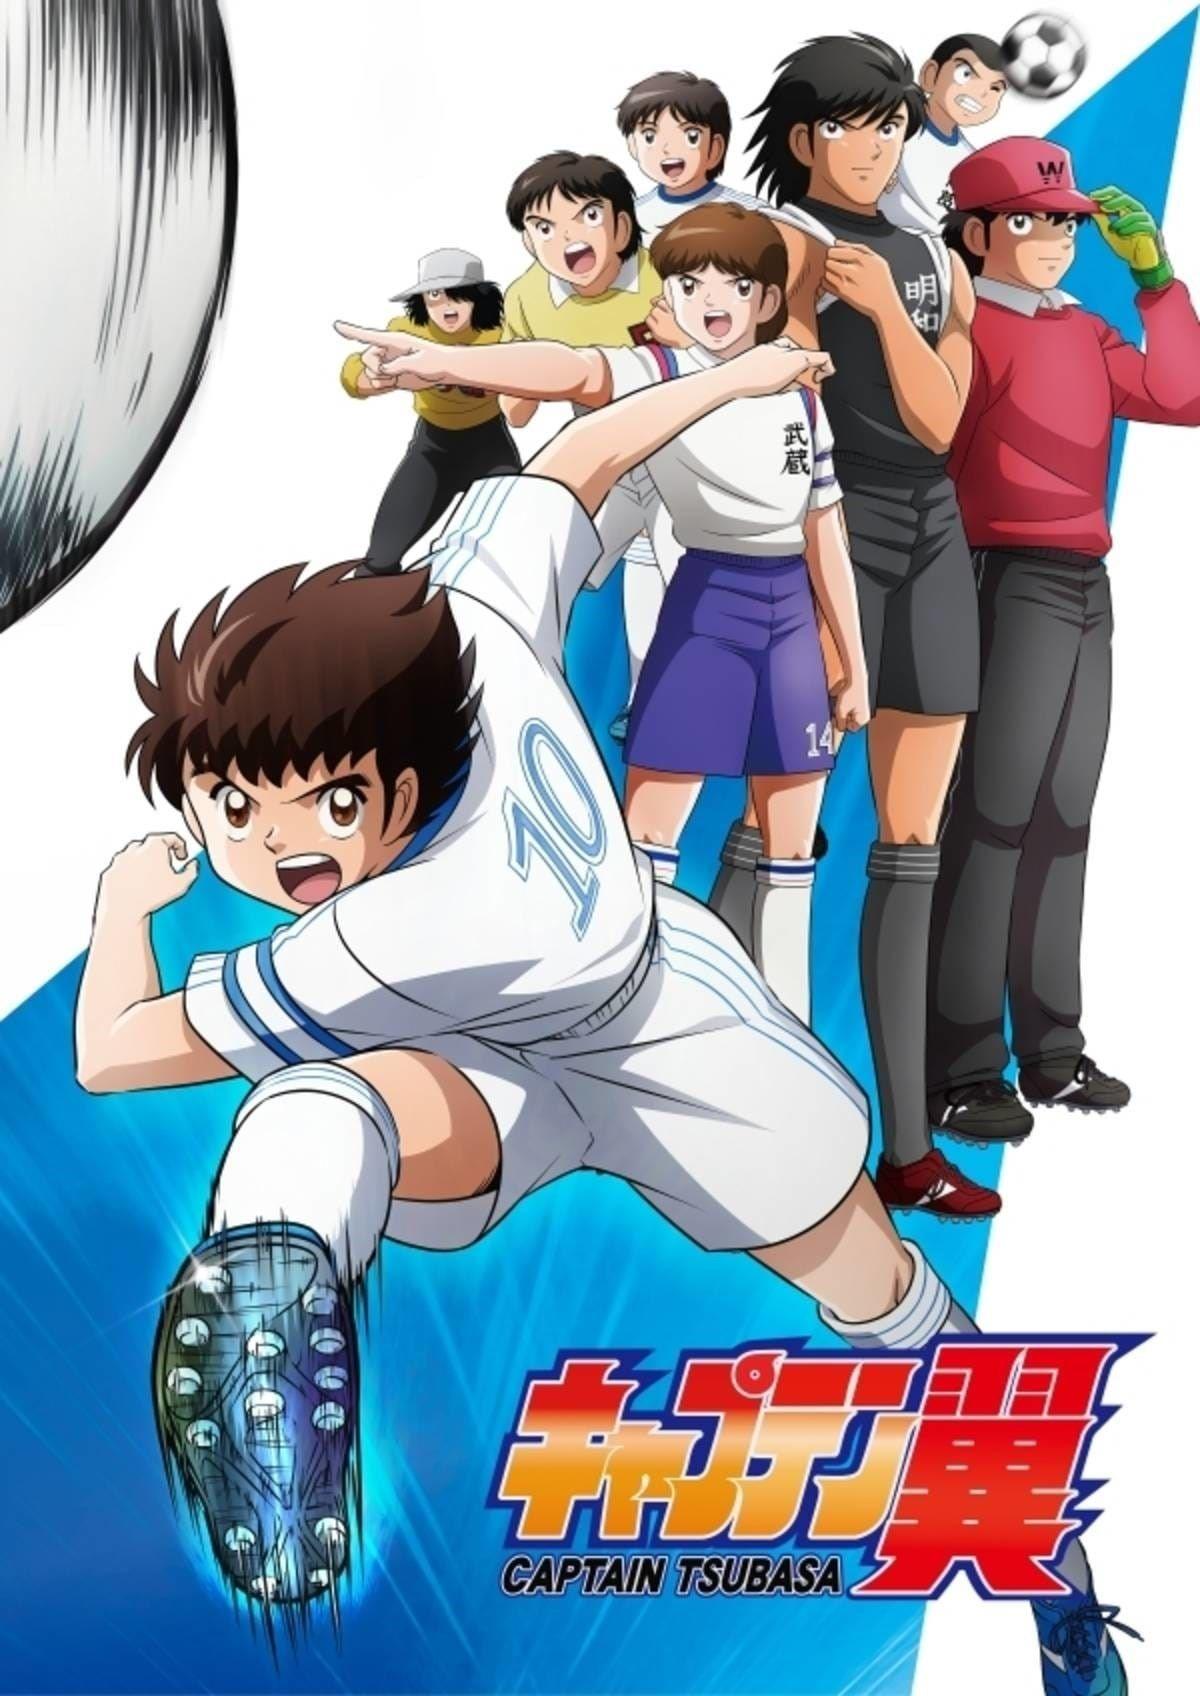 Captain tsubasa hitman reborn reborn katekyo hitman series movies tv series anime